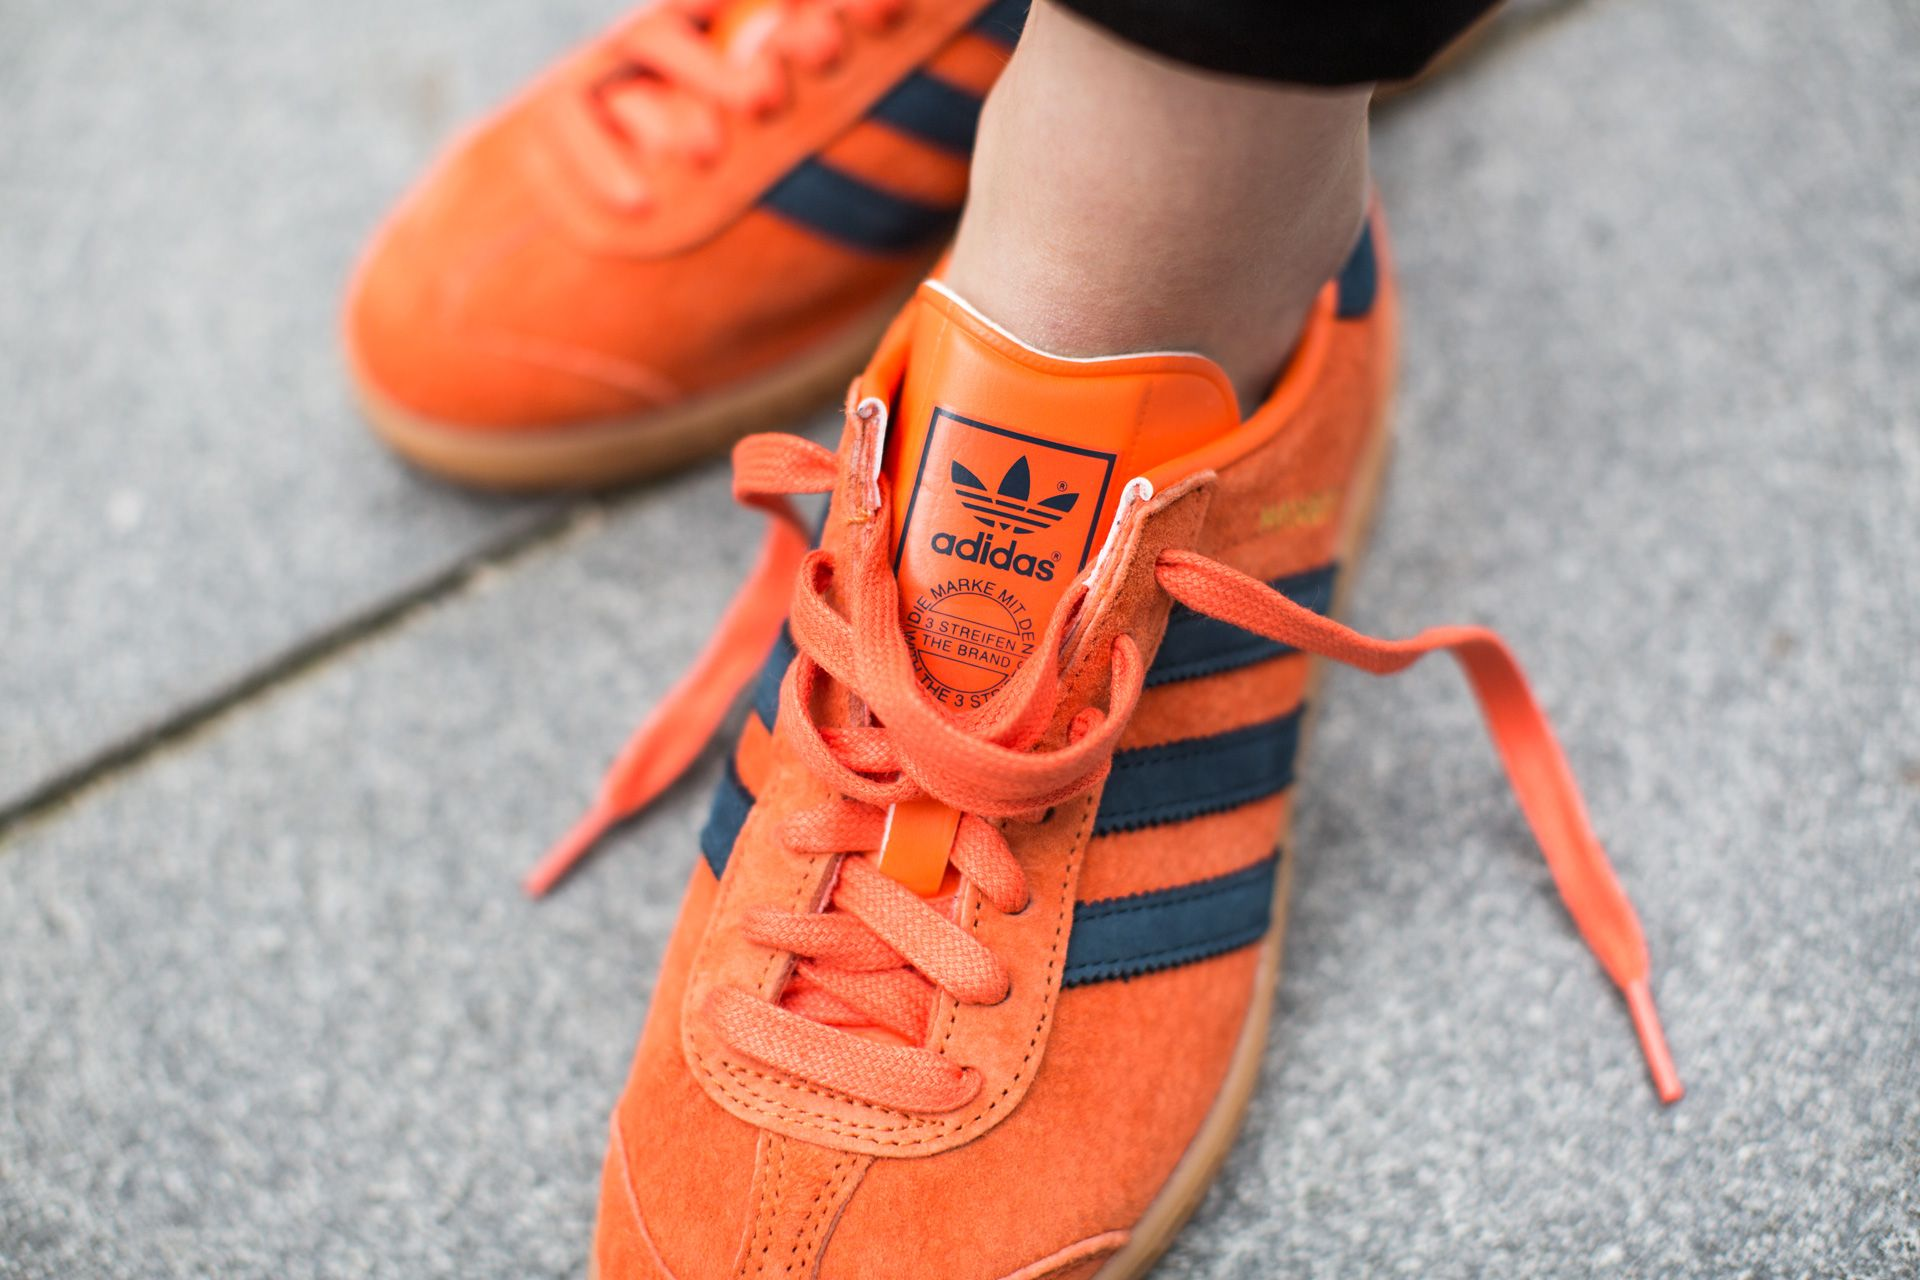 Schuhe Adidas Shop Shop Munich Shop Munich Adidas Schuhe